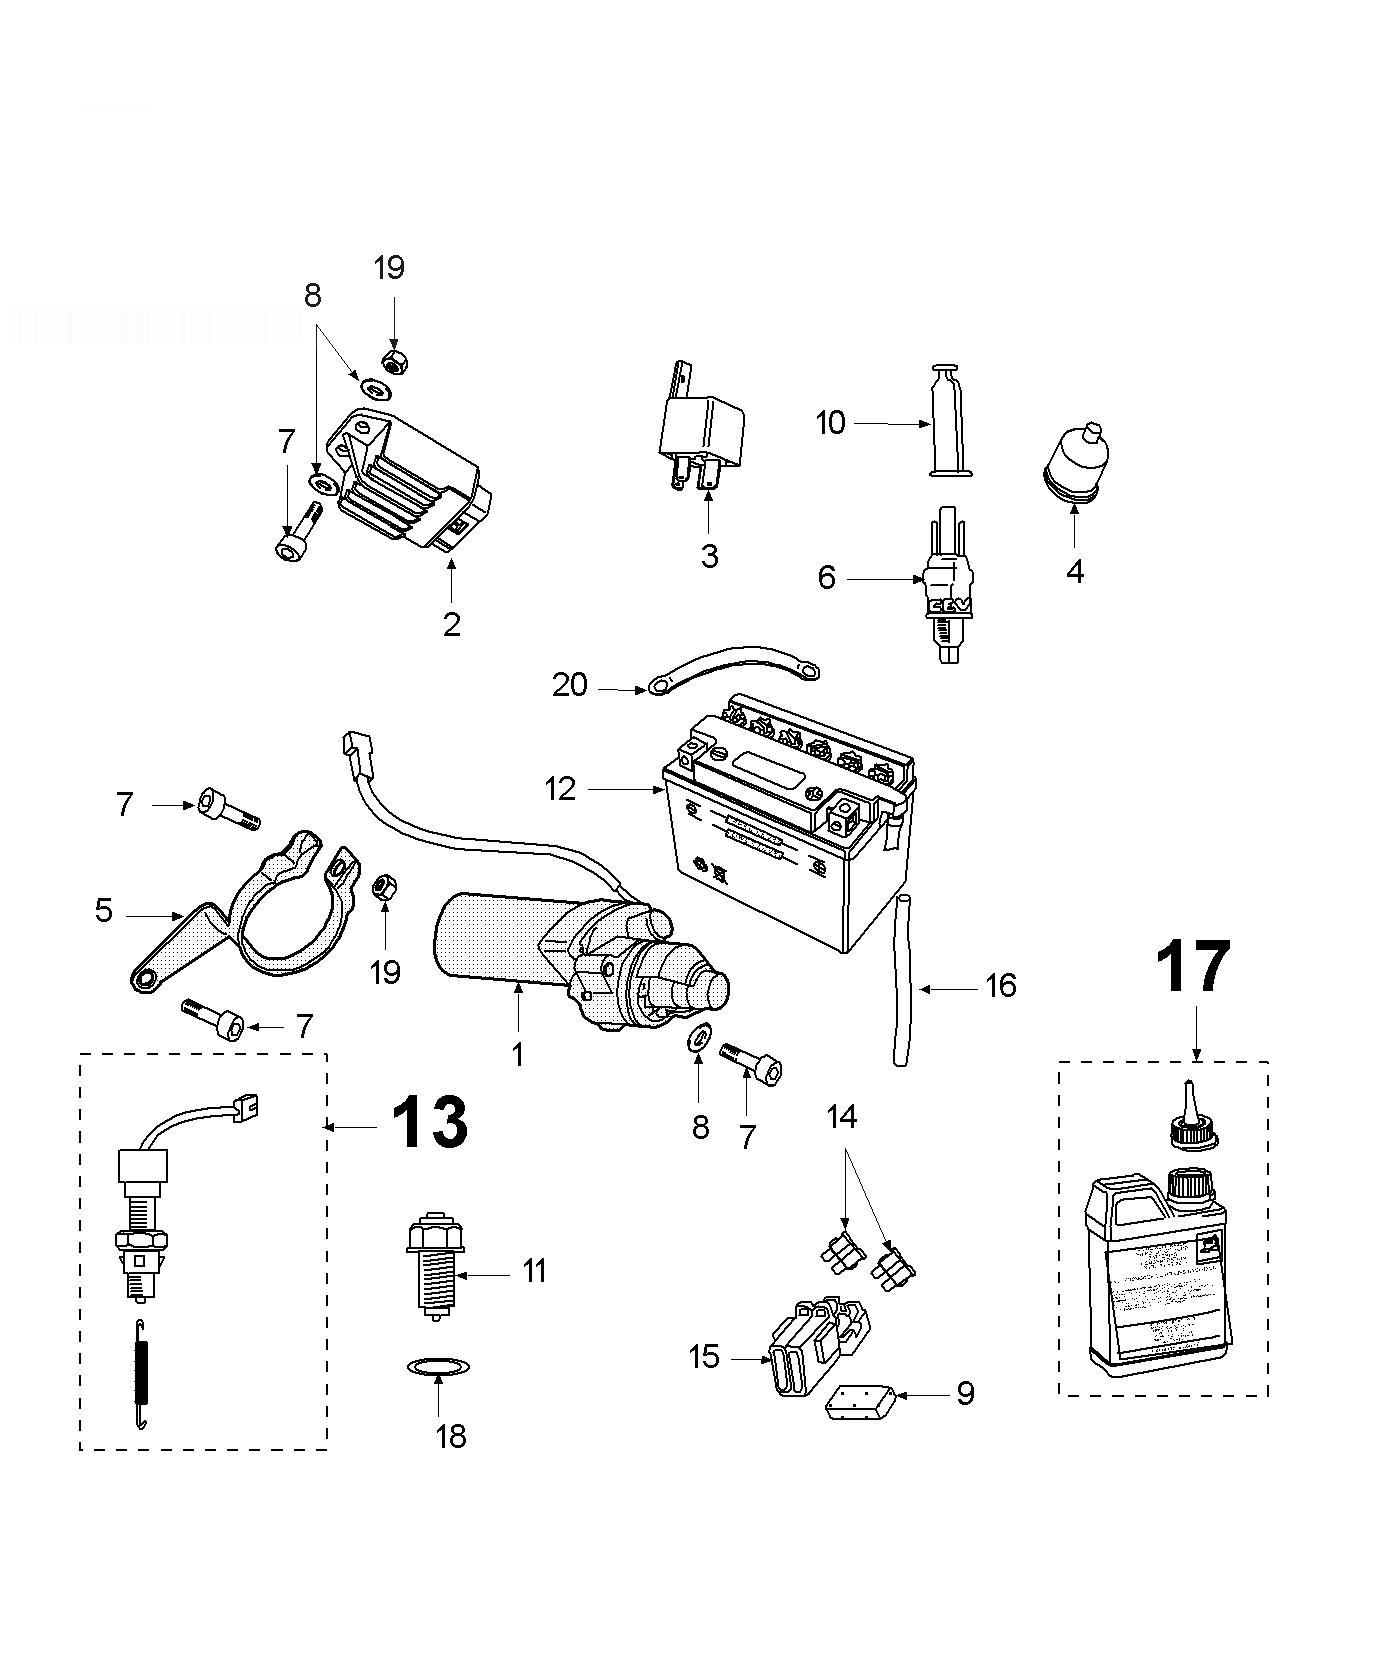 Peugeot Xps Sm Electric Equipment